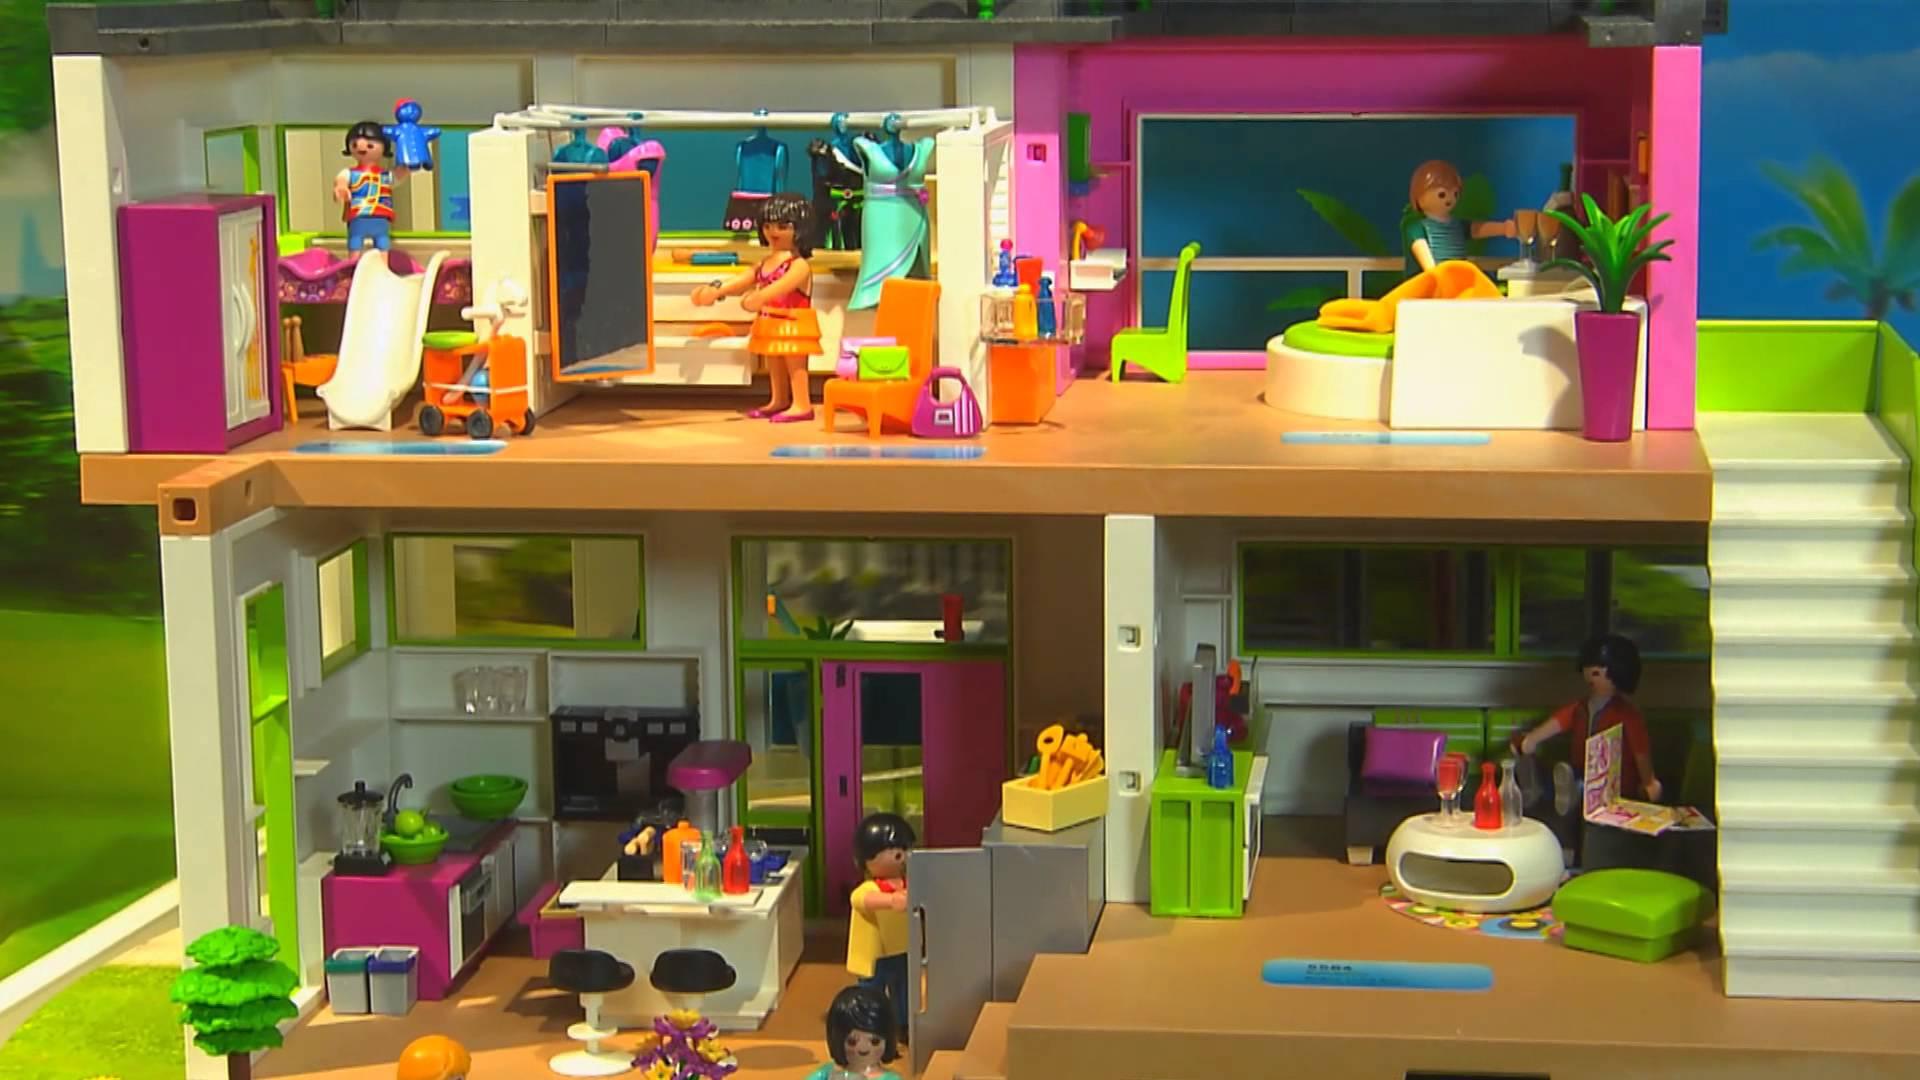 Maison playmobil moderne photo - zagafrica.fr